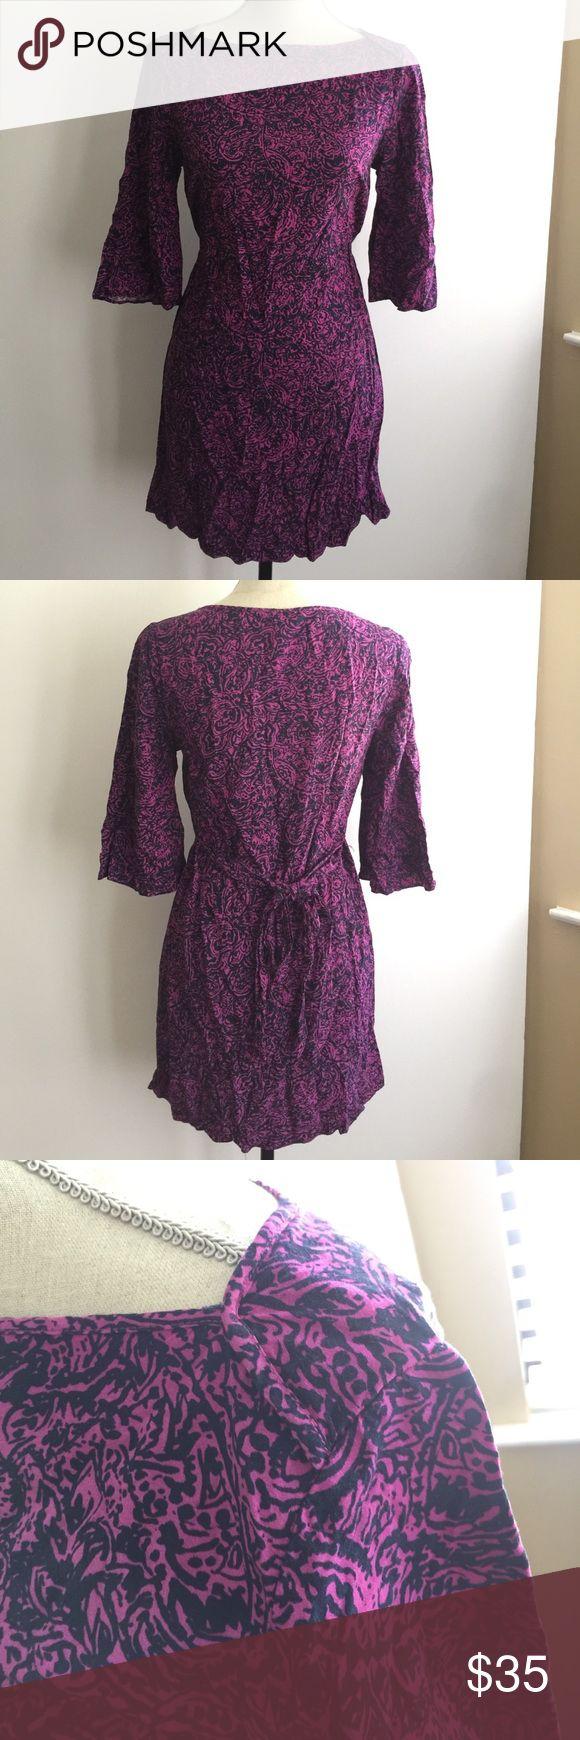 Banana Republic Dress Size XS Purple and black 1/4 sleeve dress with string belt Banana Republic Dresses Midi